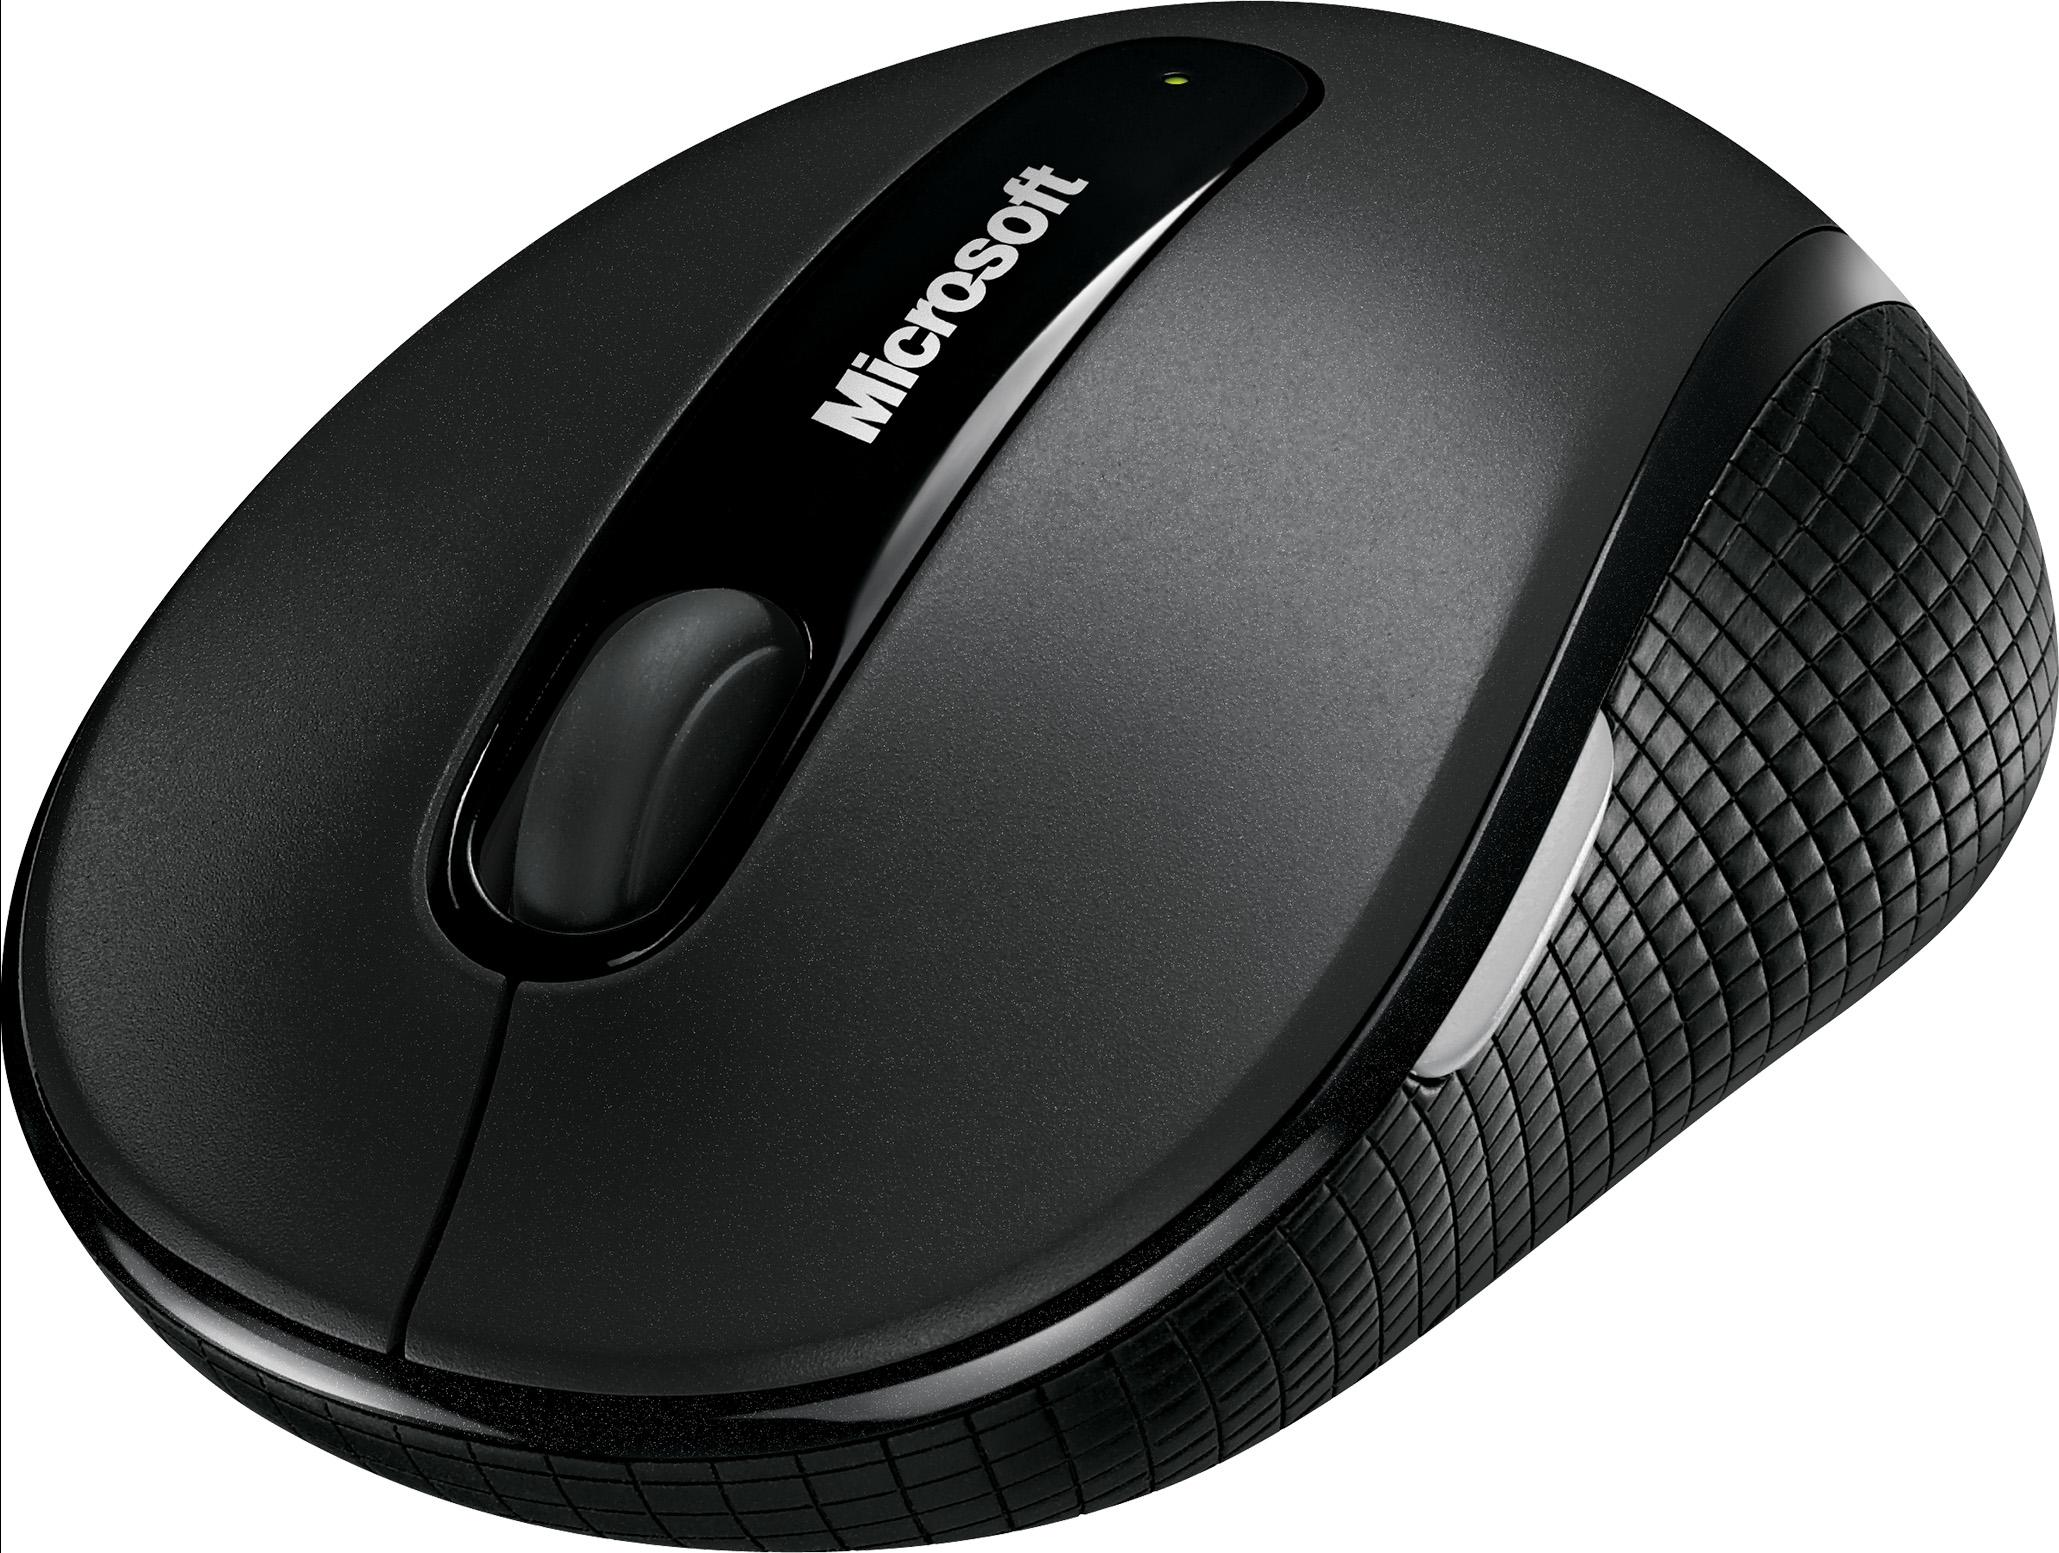 Microsoft Wireless Mobile Mouse 4000 Mac Os X Wire Center 200175 Circuitwriter Pen With Precision Conductive Ink Buy Graphite Store En Au Rh Com